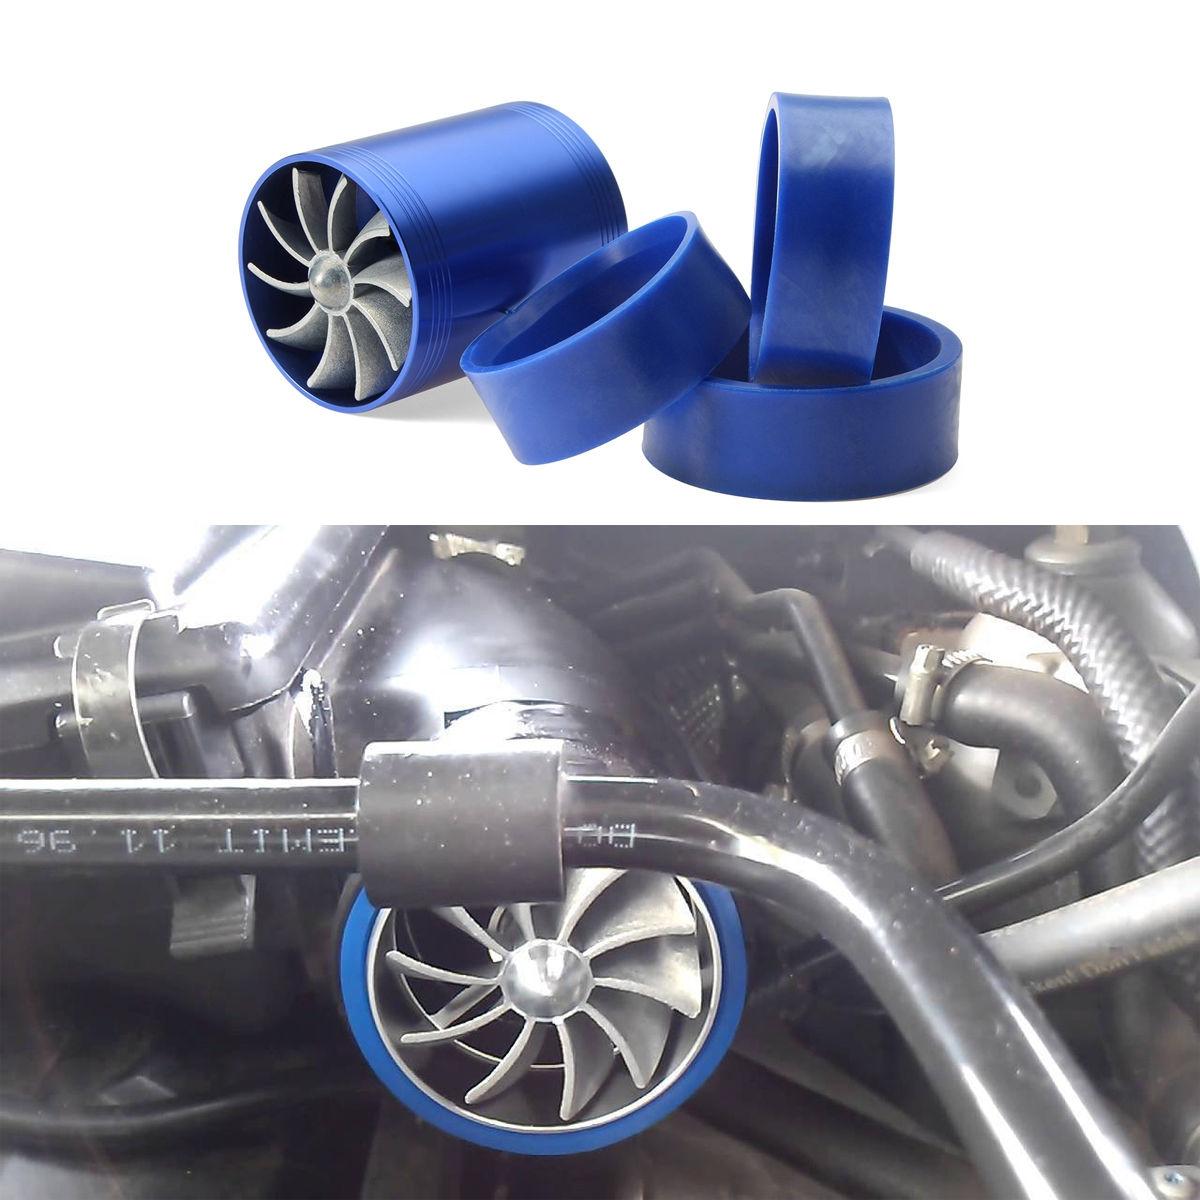 Generic Supercharger Power Air Intake Turbonator Dual Fan